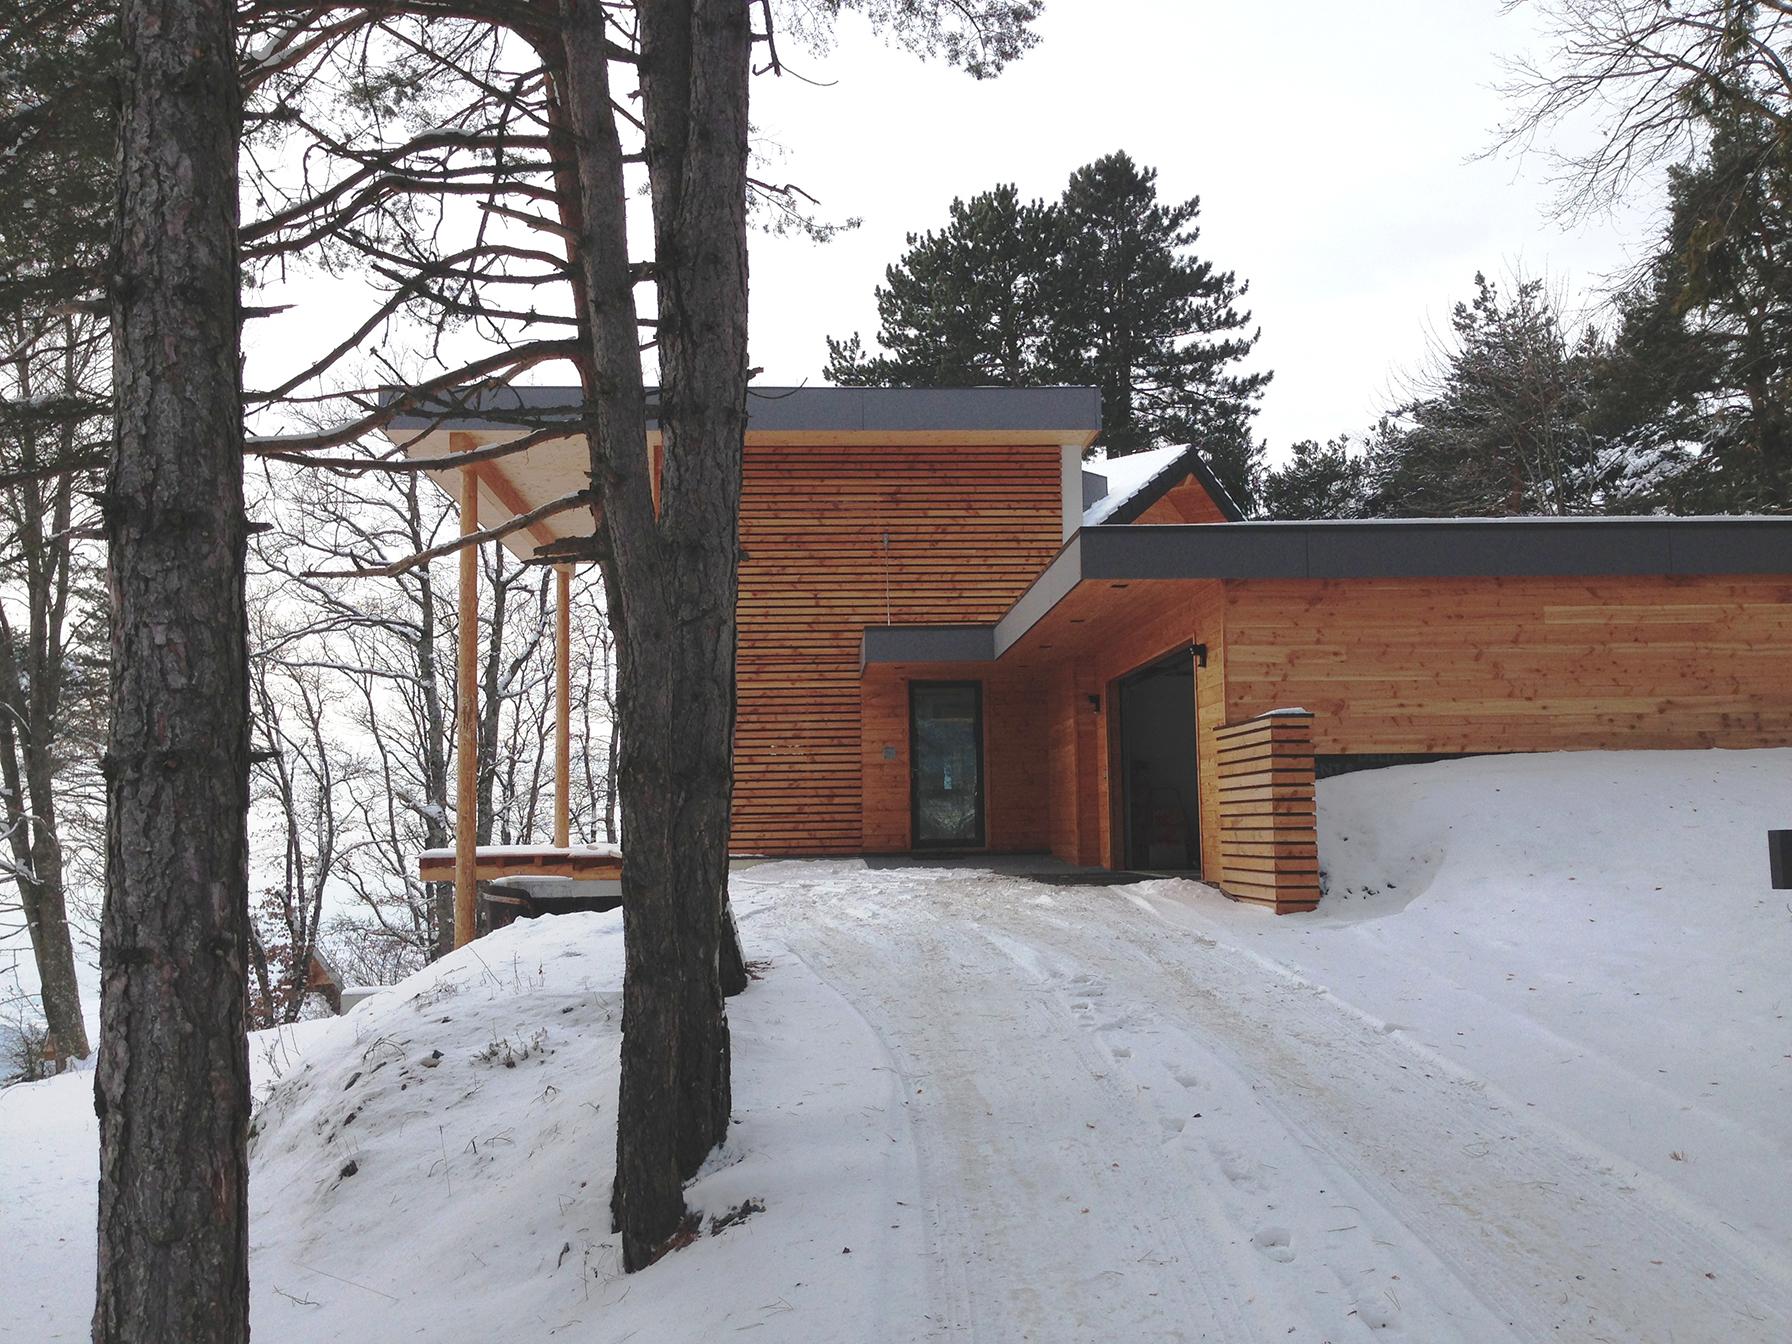 Maison Minergie | Architecte GUYOT Nelly |